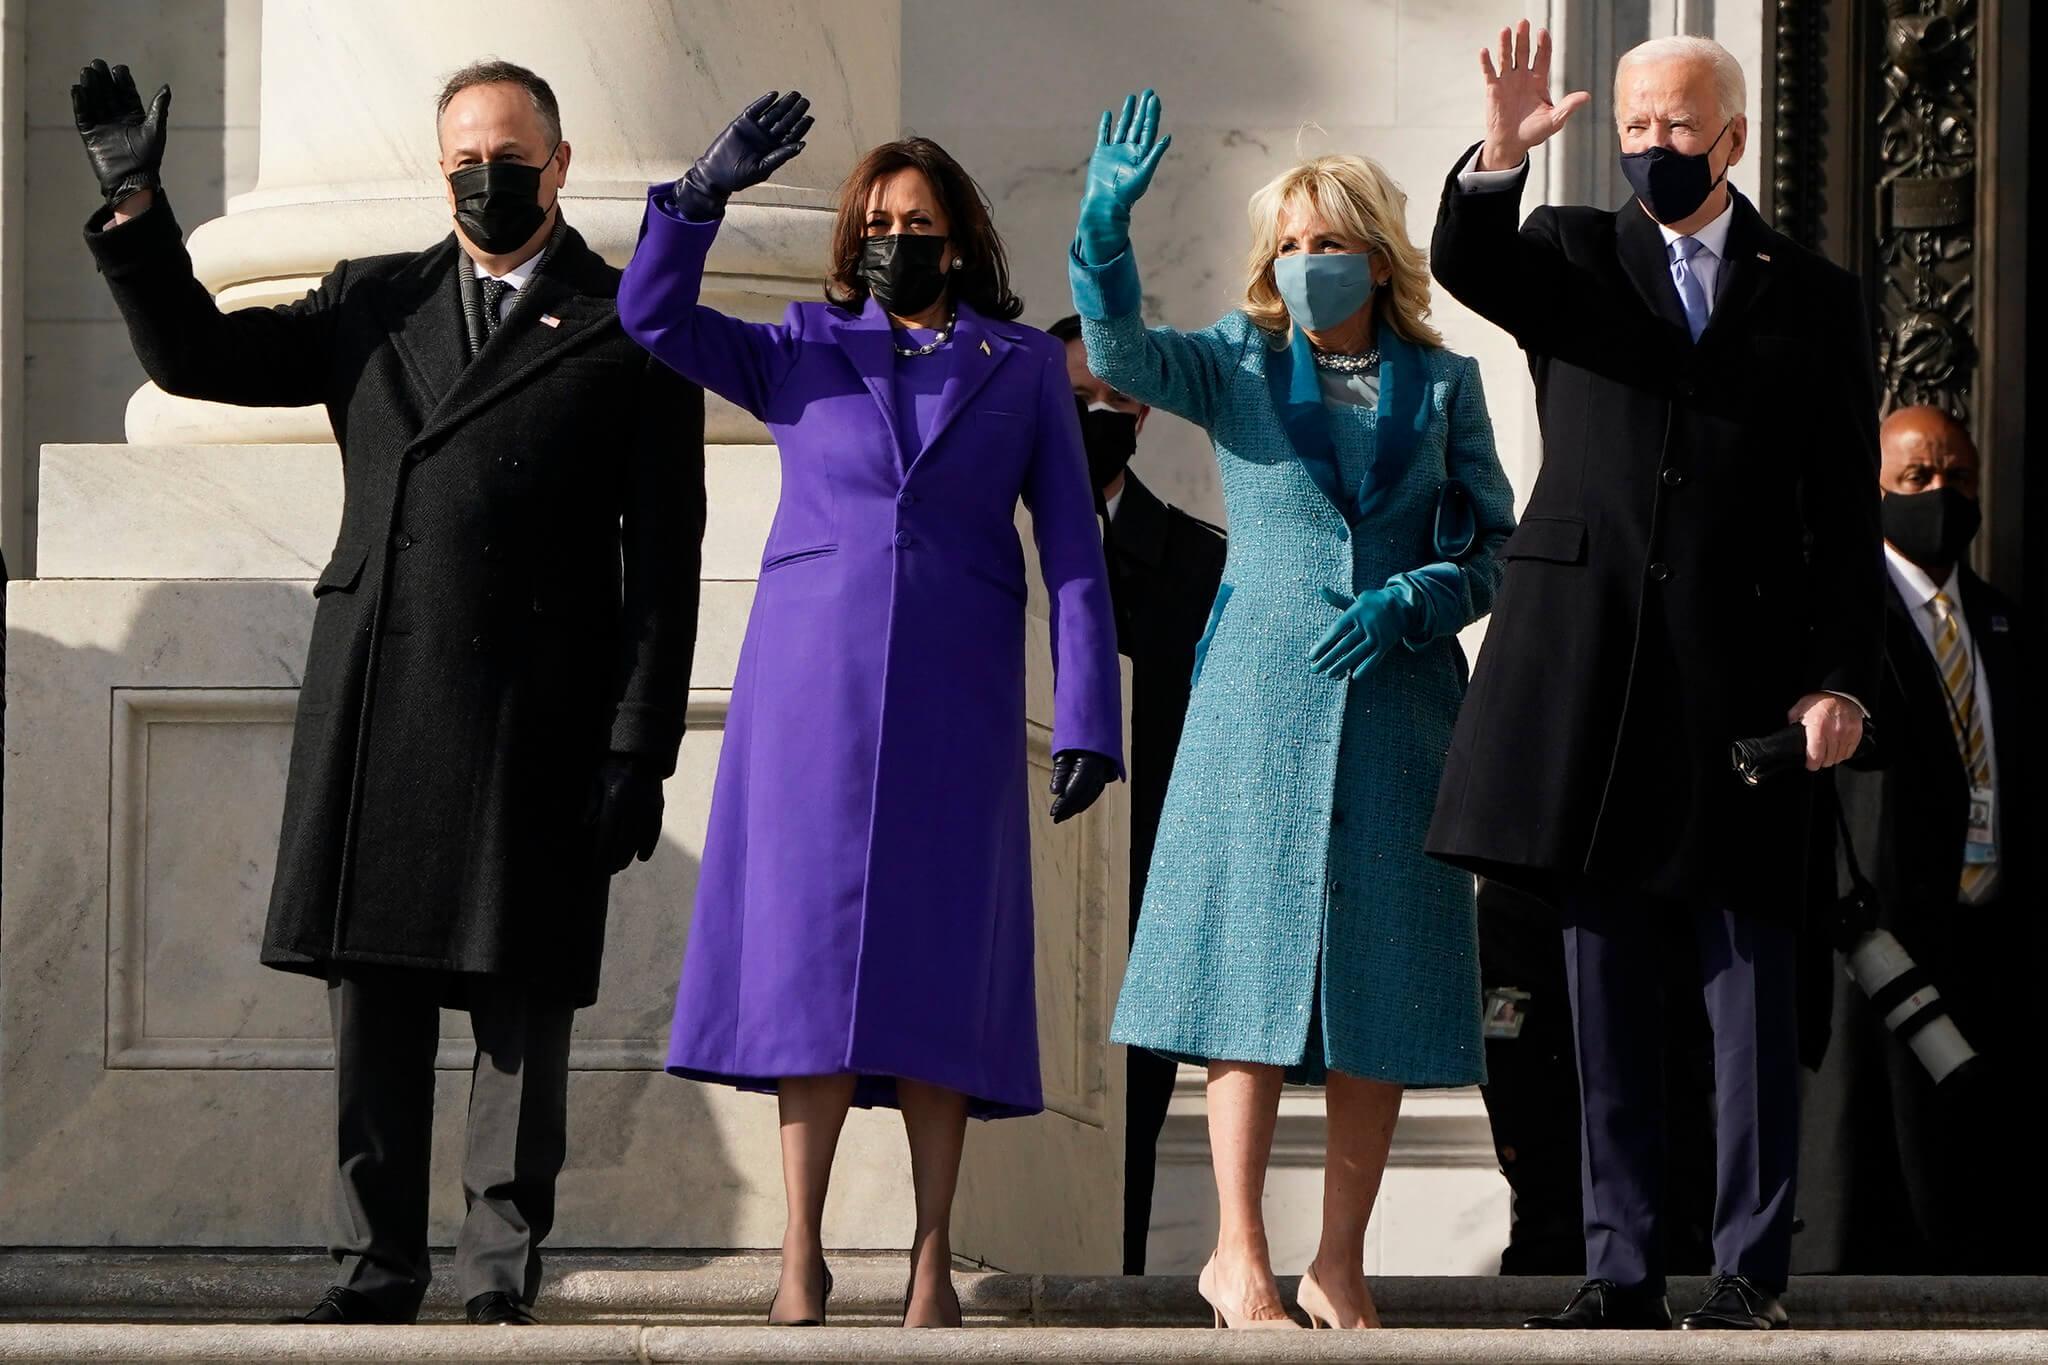 Joe Biden and wife with Kamala Harris and husband